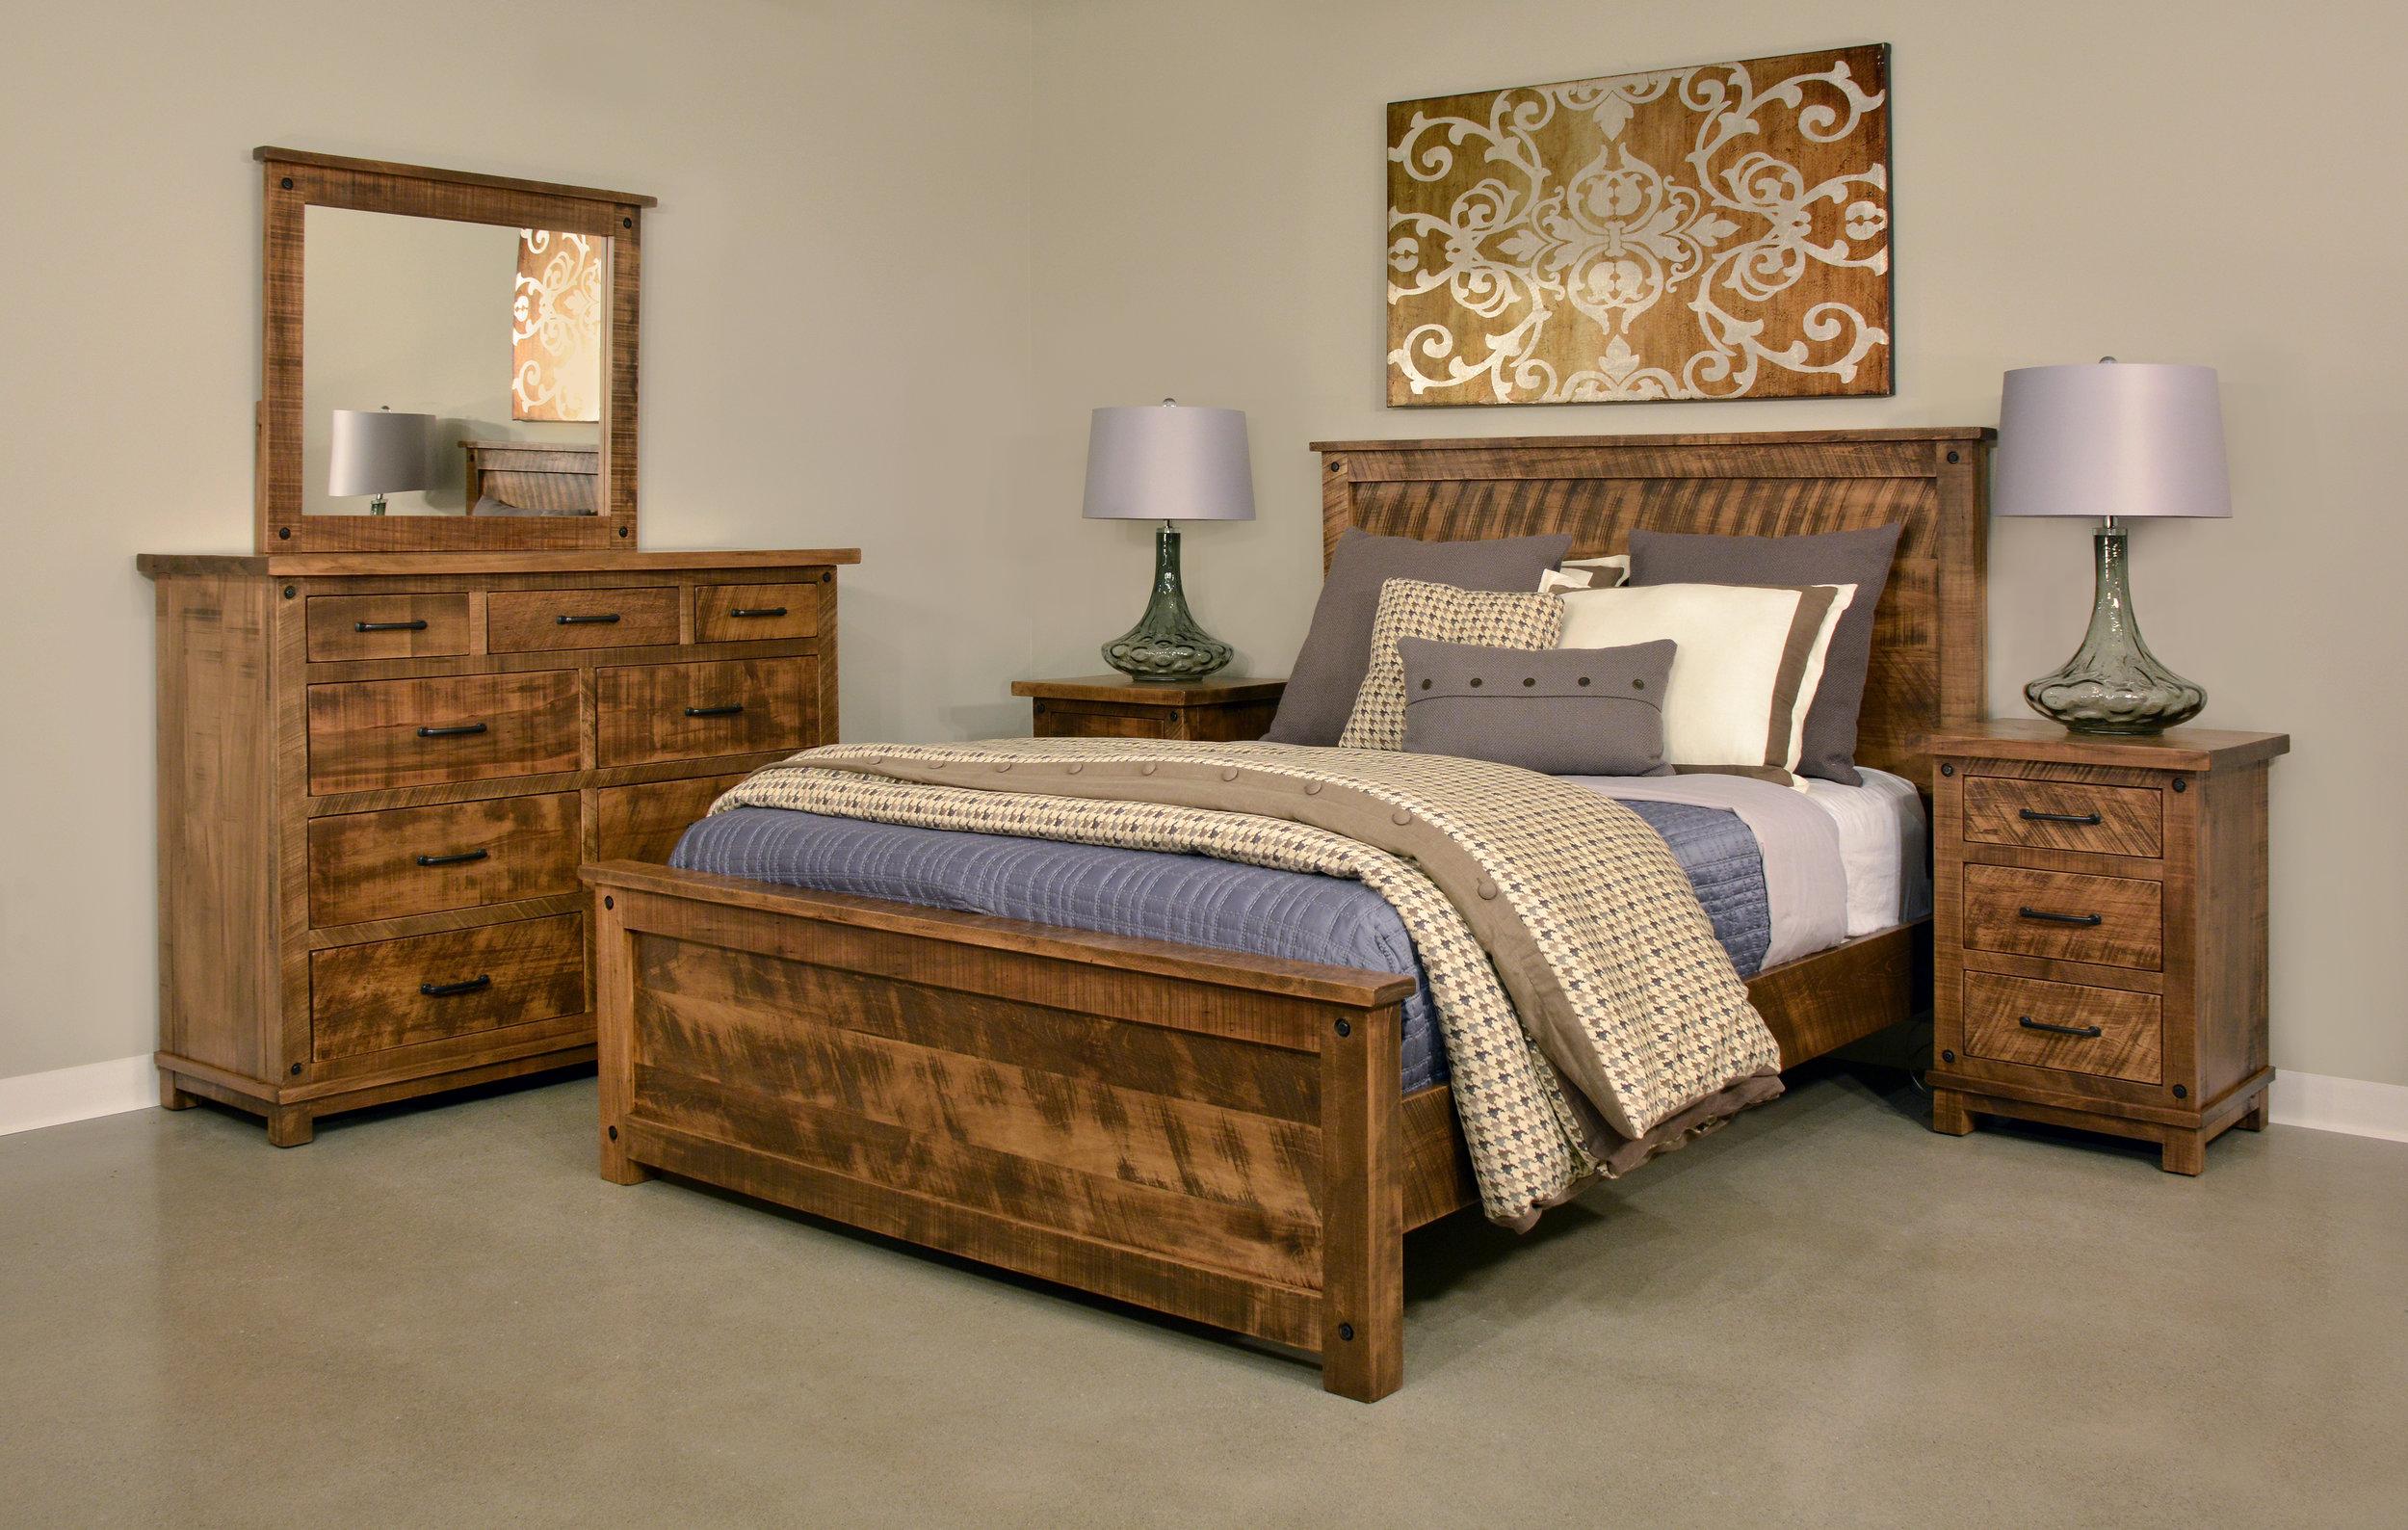 rustic bedroom sets for sale in Warren, PA